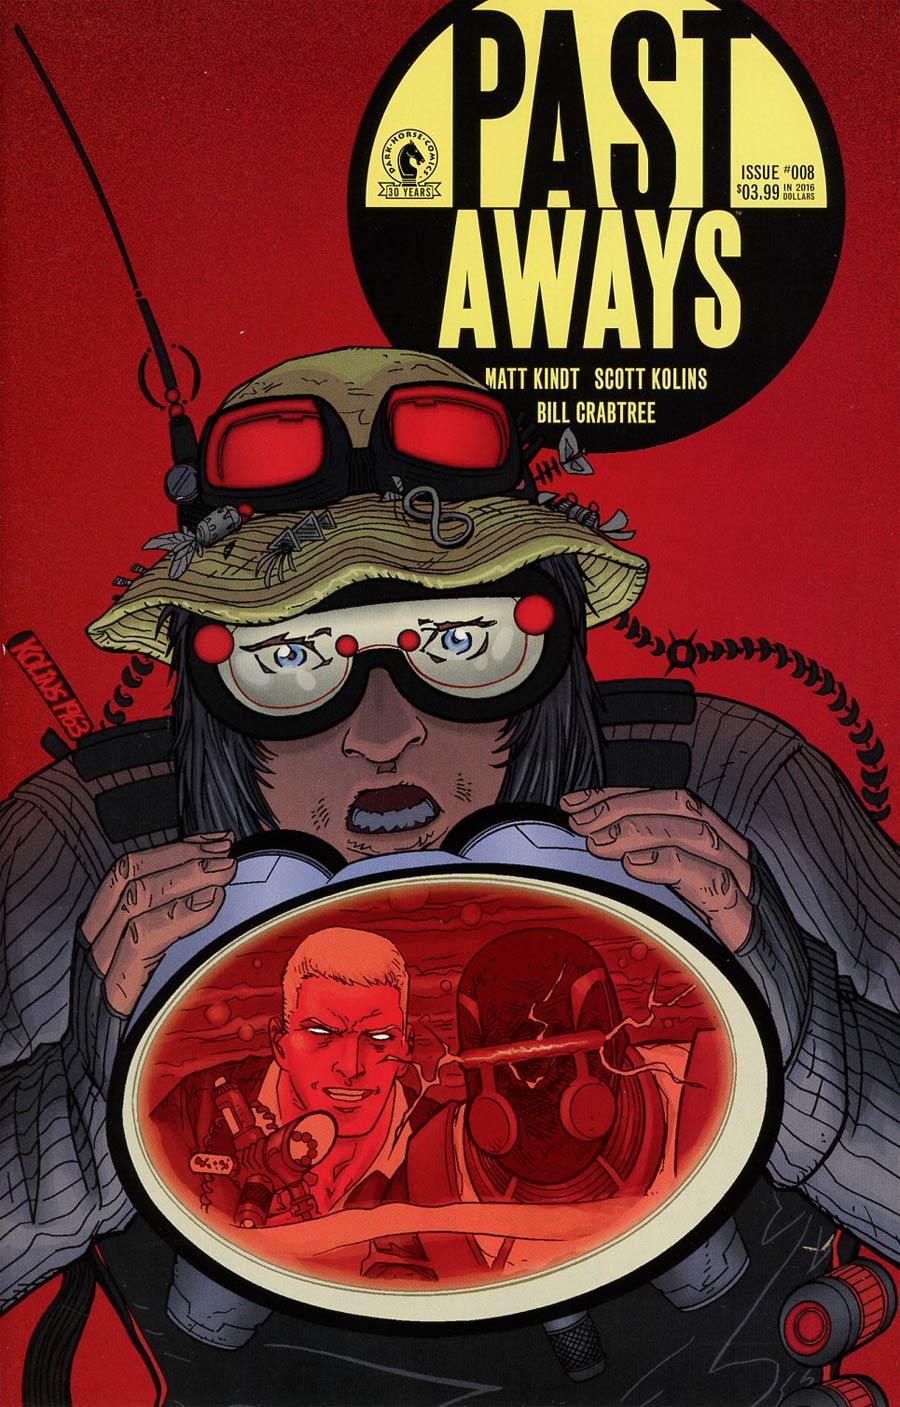 Pastaways #8